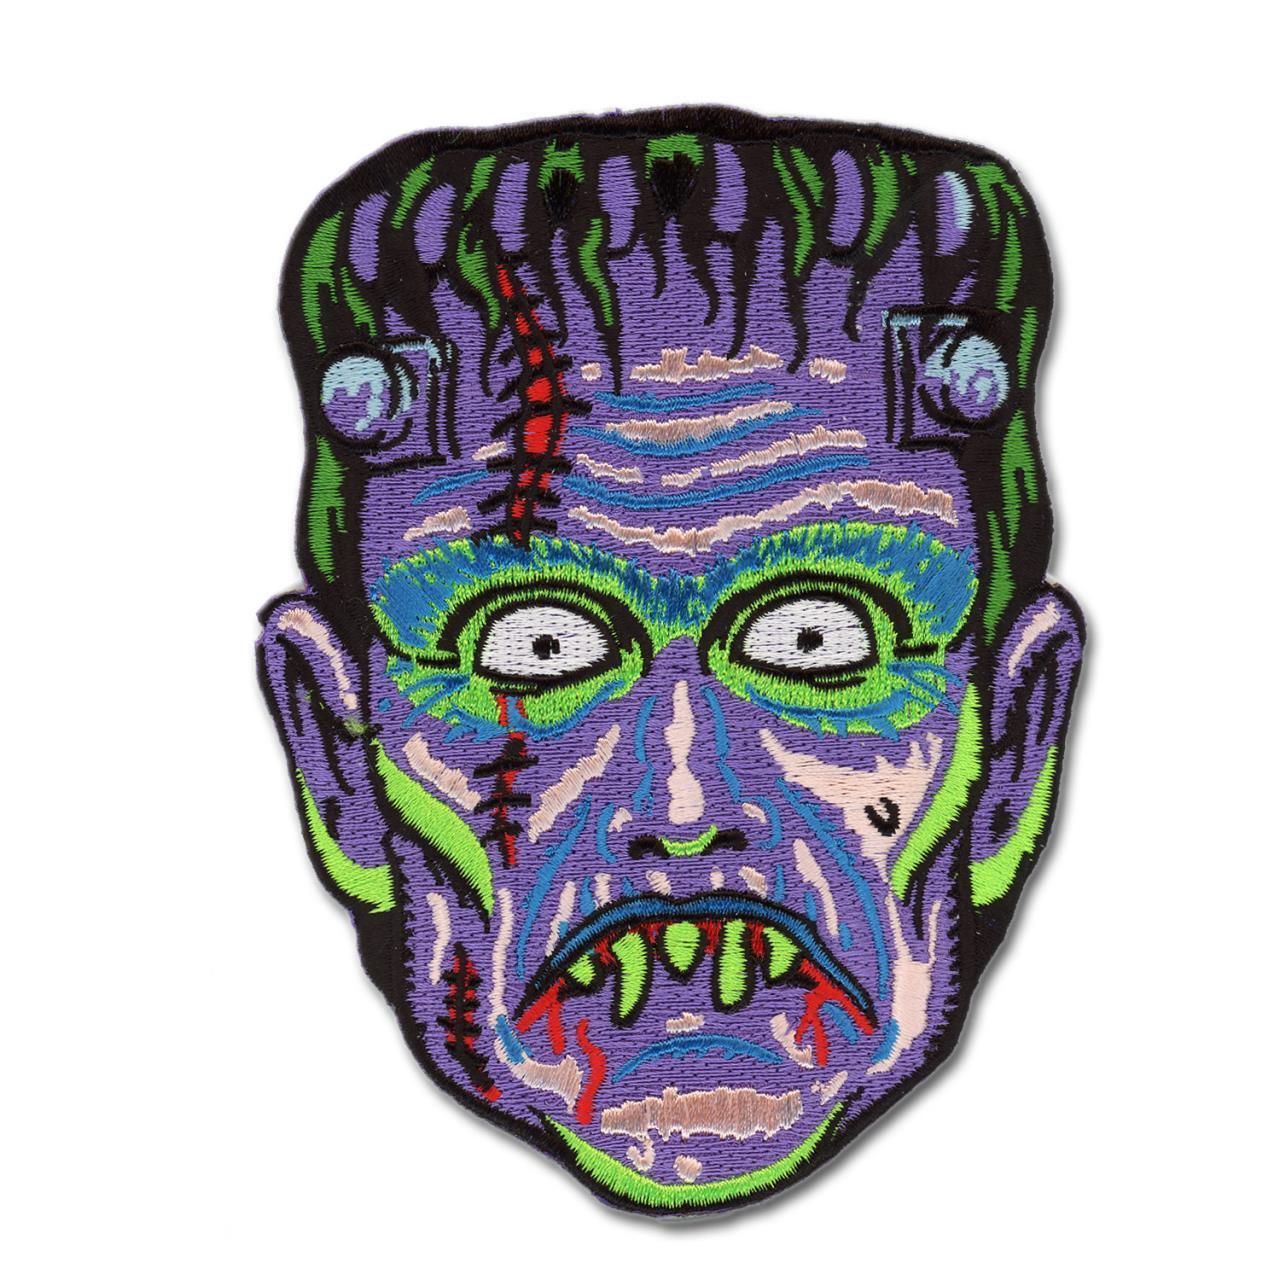 Retro A Go Go Son of Frankie Embroidered Patch - Merch2rock Alternative  Clothing 9d497ffa9478